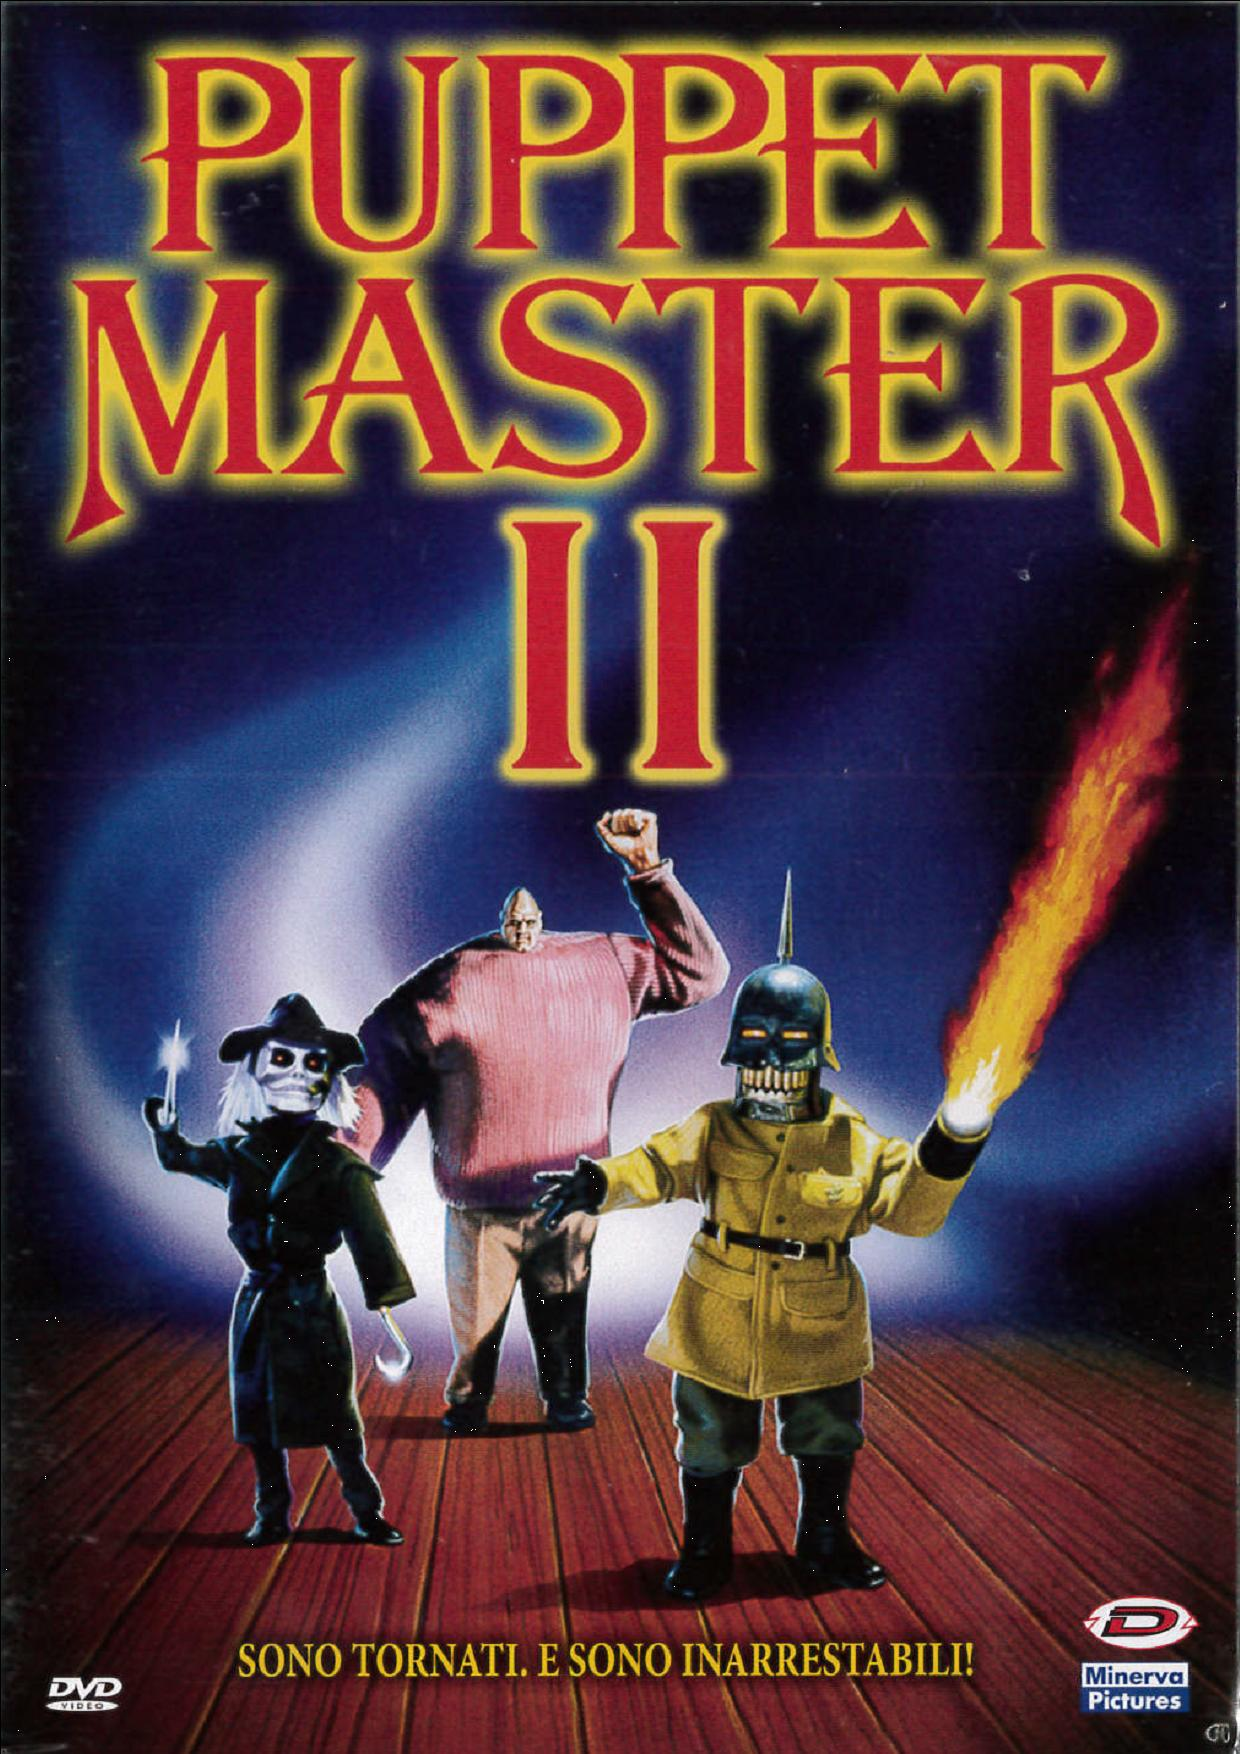 PUPPET MASTER 2 (DVD)